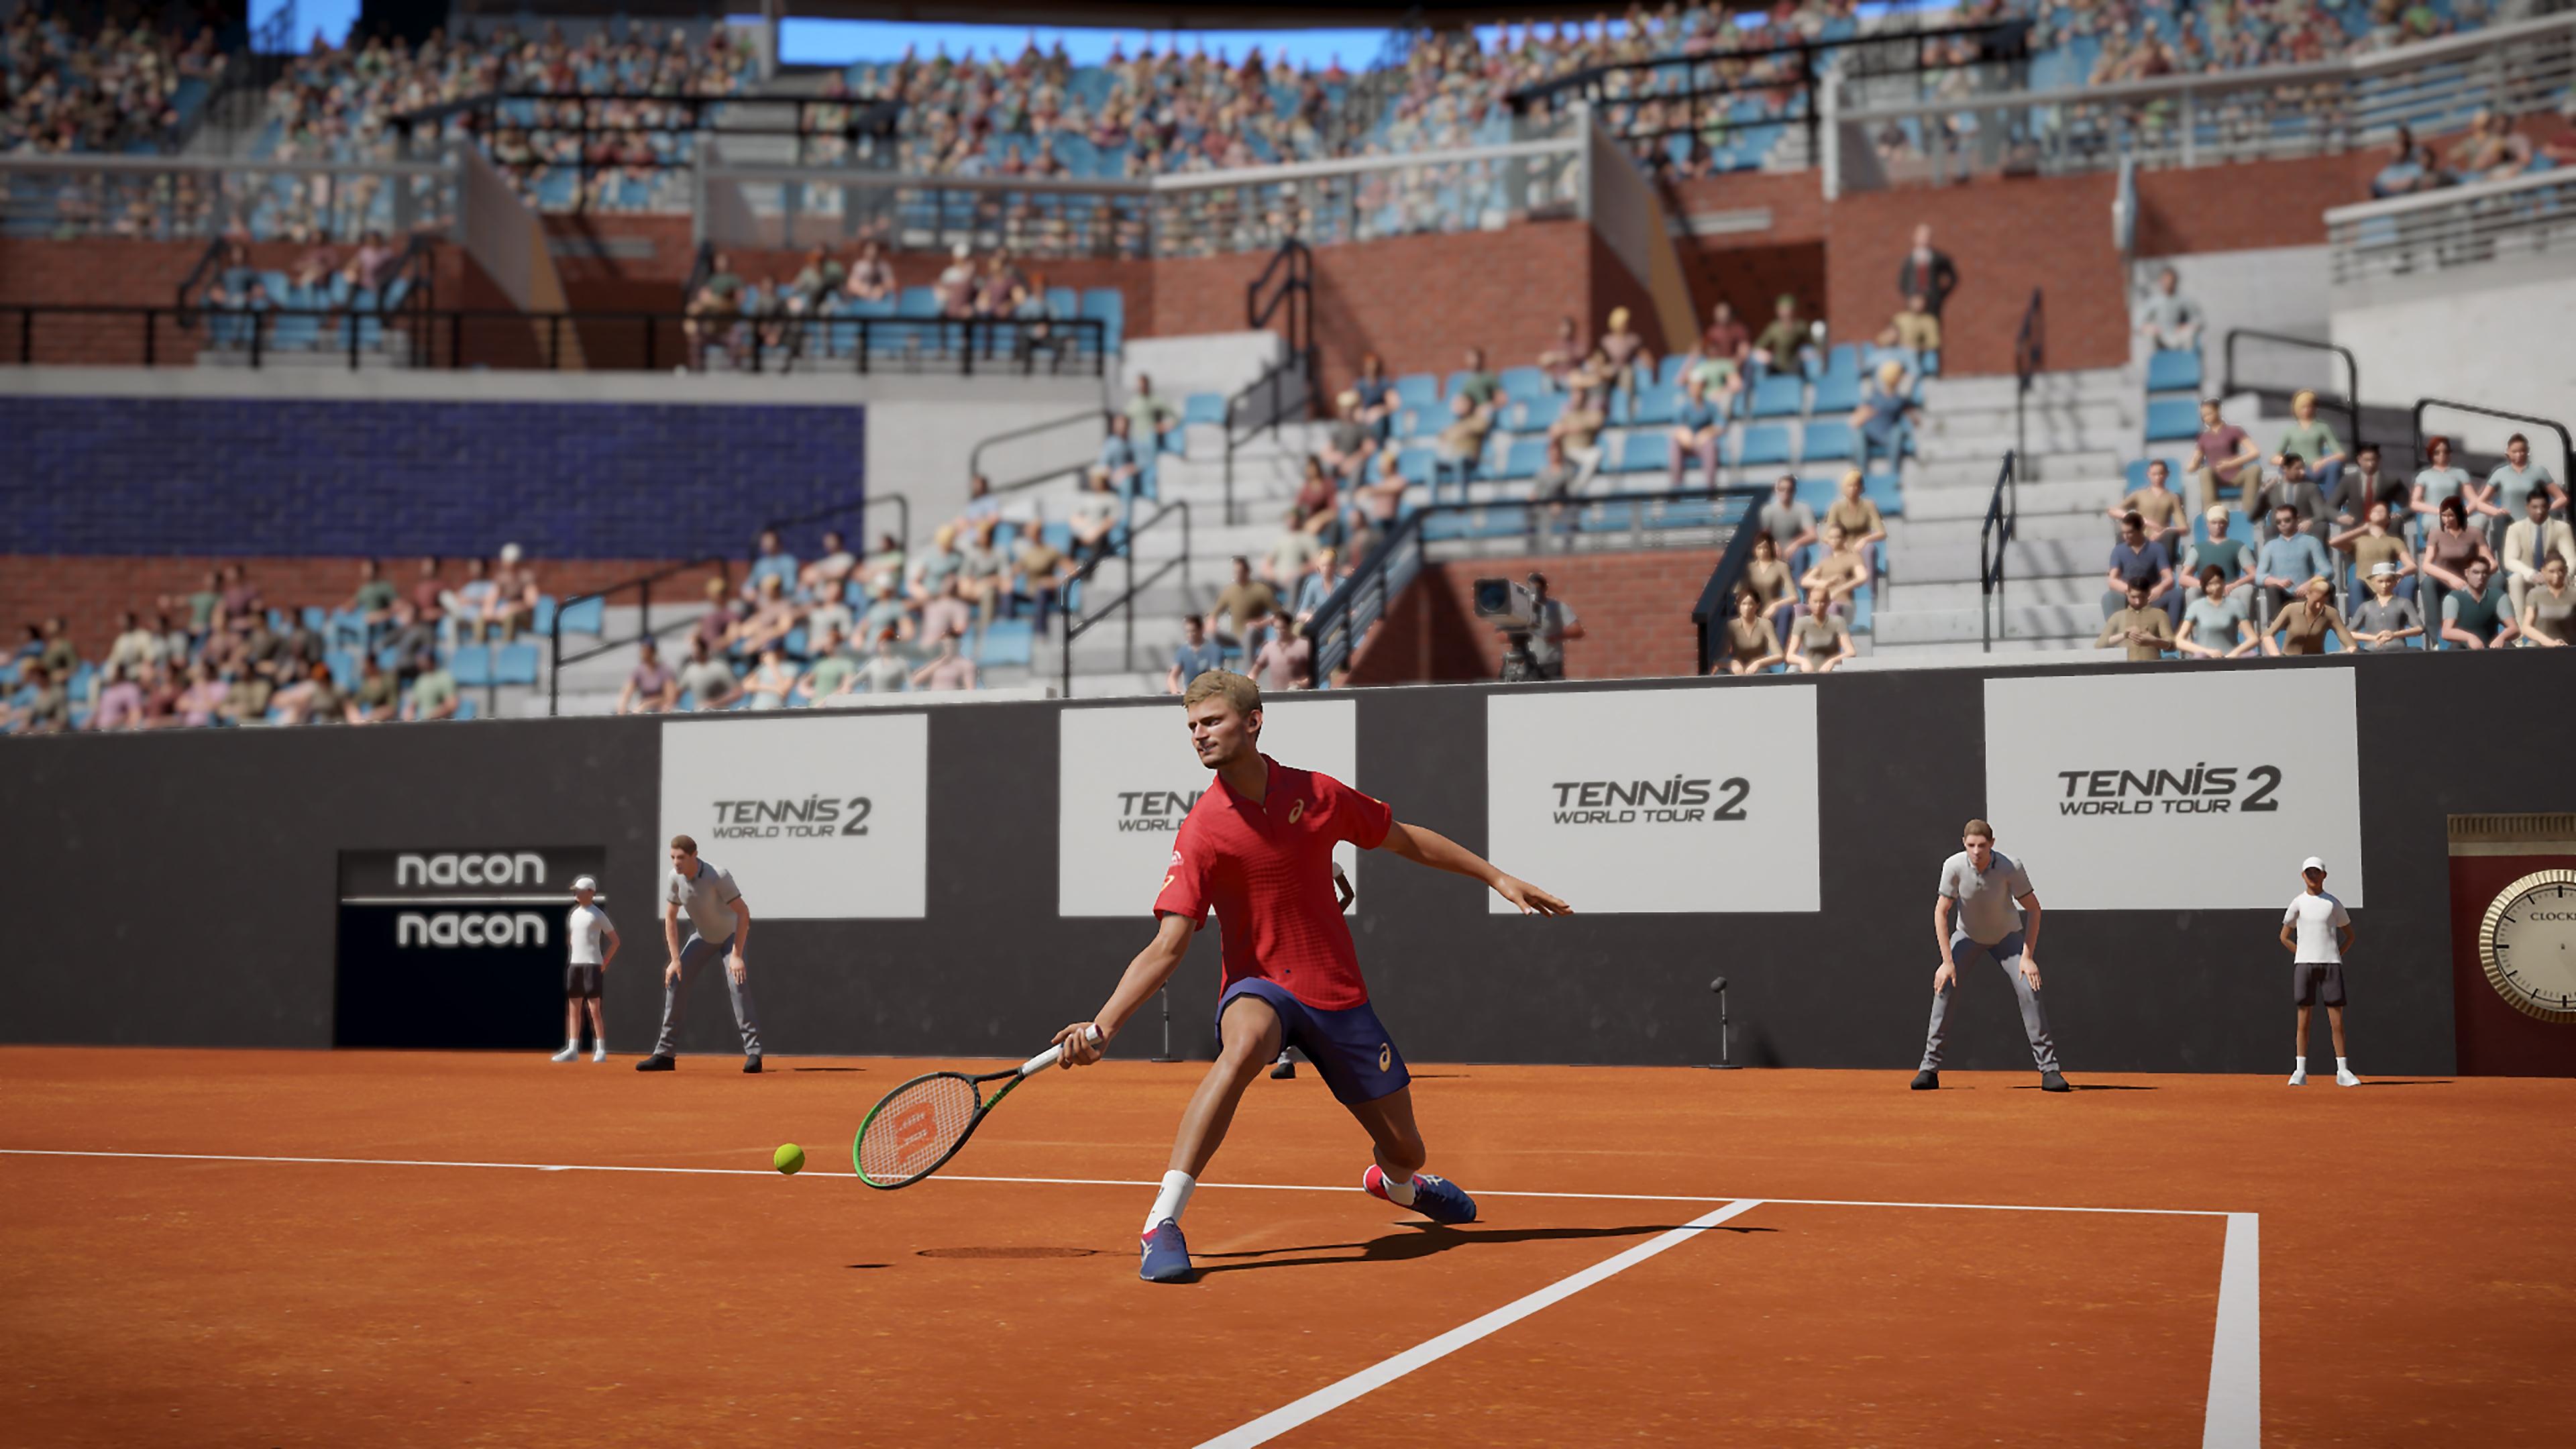 Istantanea della schermata Tennis World Tour 2